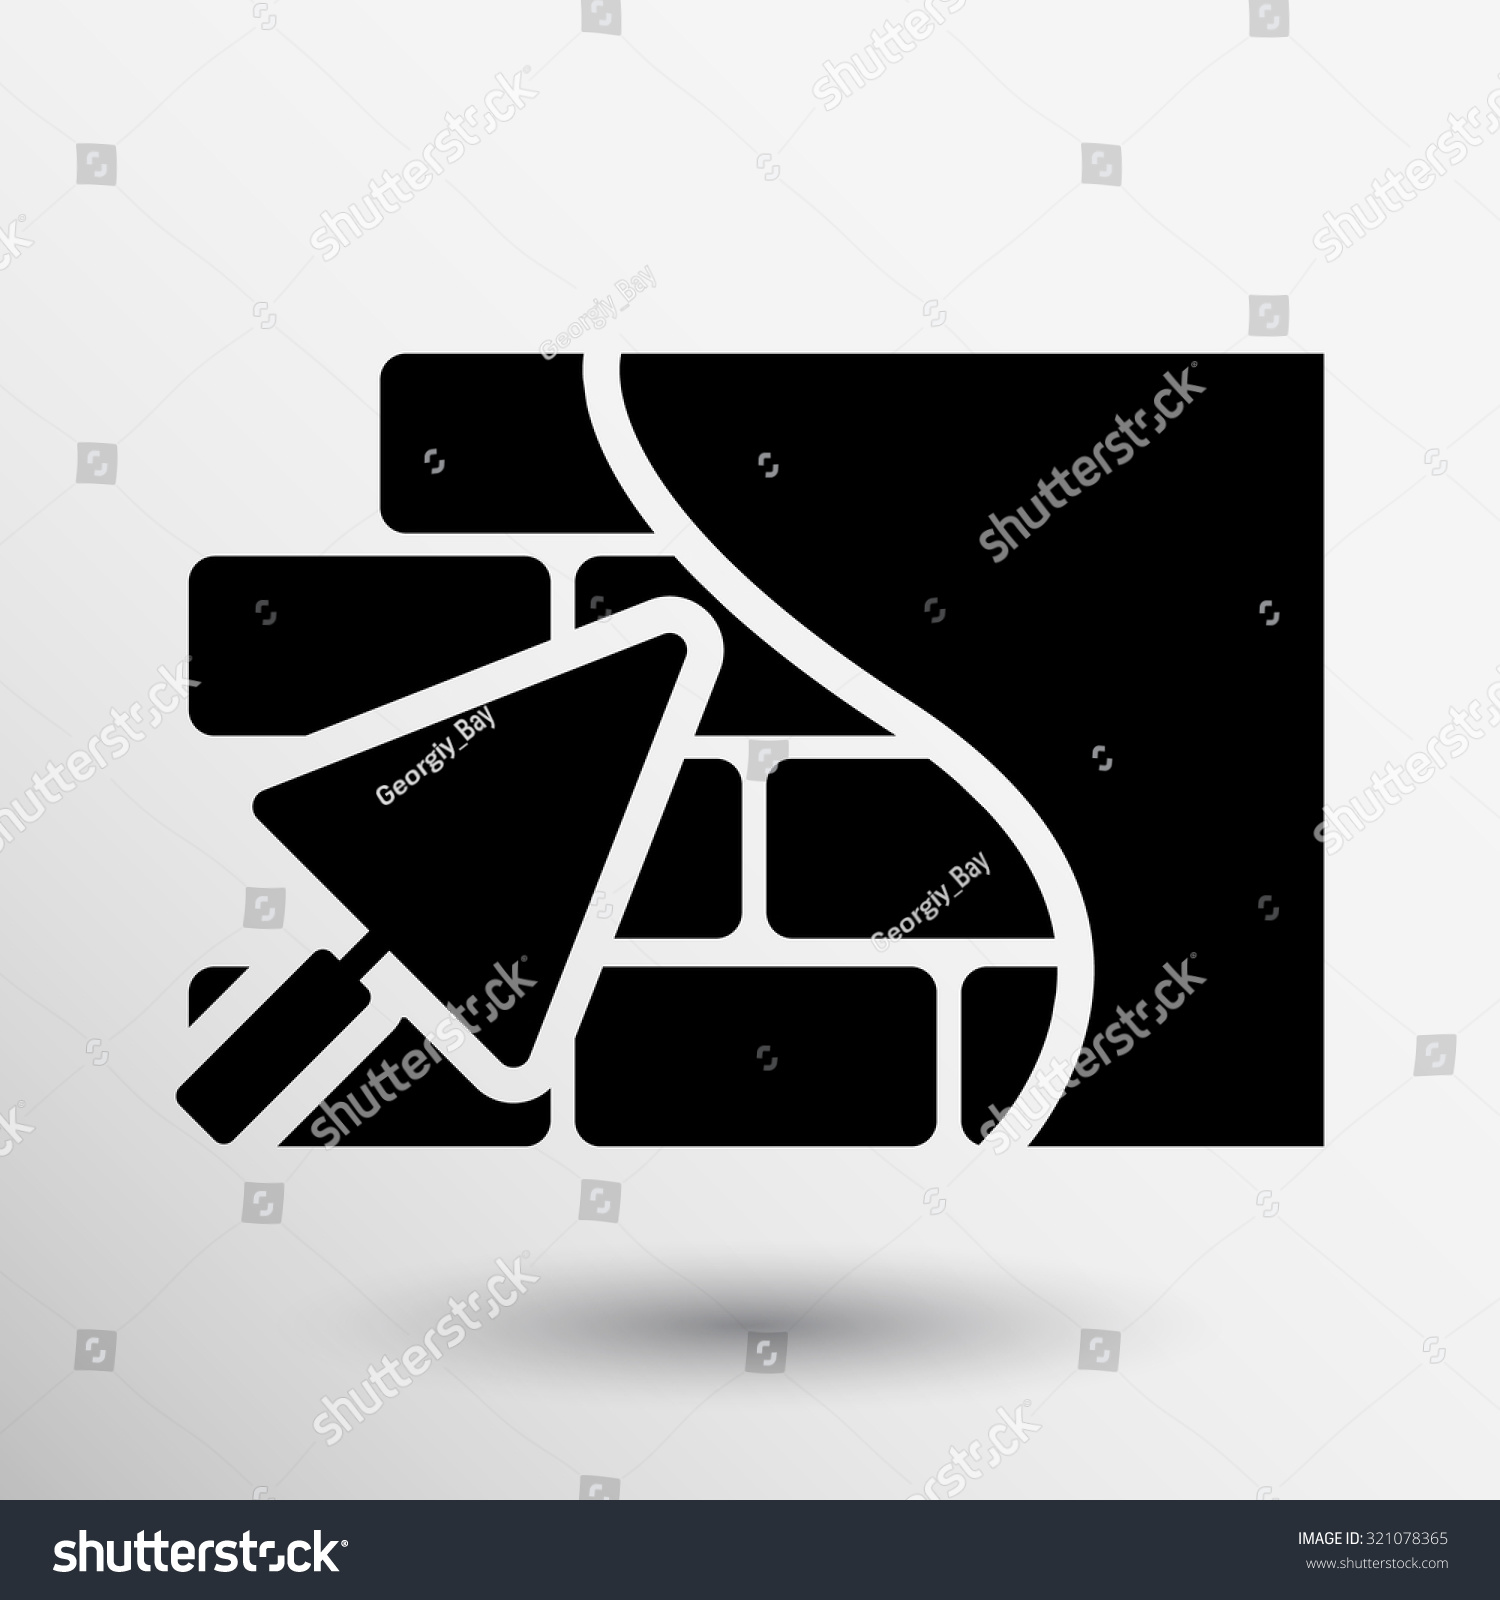 Masonry Trowel Logo : Brick wall icon trowel button stock vector